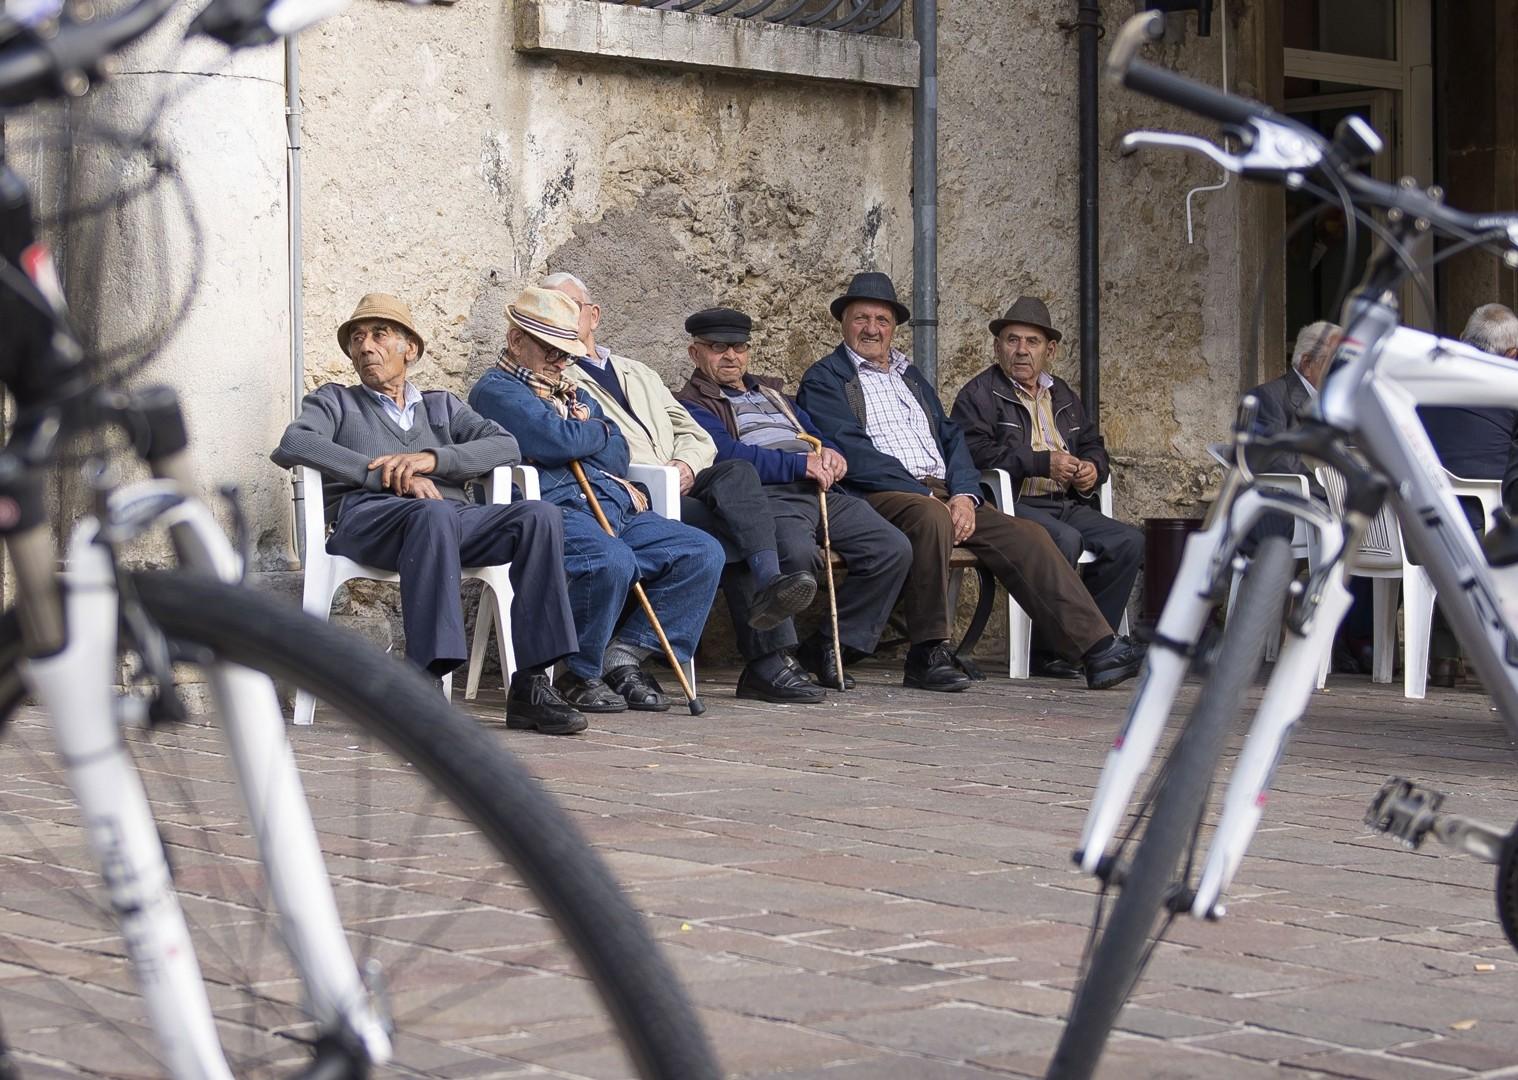 leisure-cycling-holiday-italy-amalfi-culture.jpg - Italy - Cilento and The Amalfi Coast - Self-Guided Leisure Cycling Holiday - Leisure Cycling